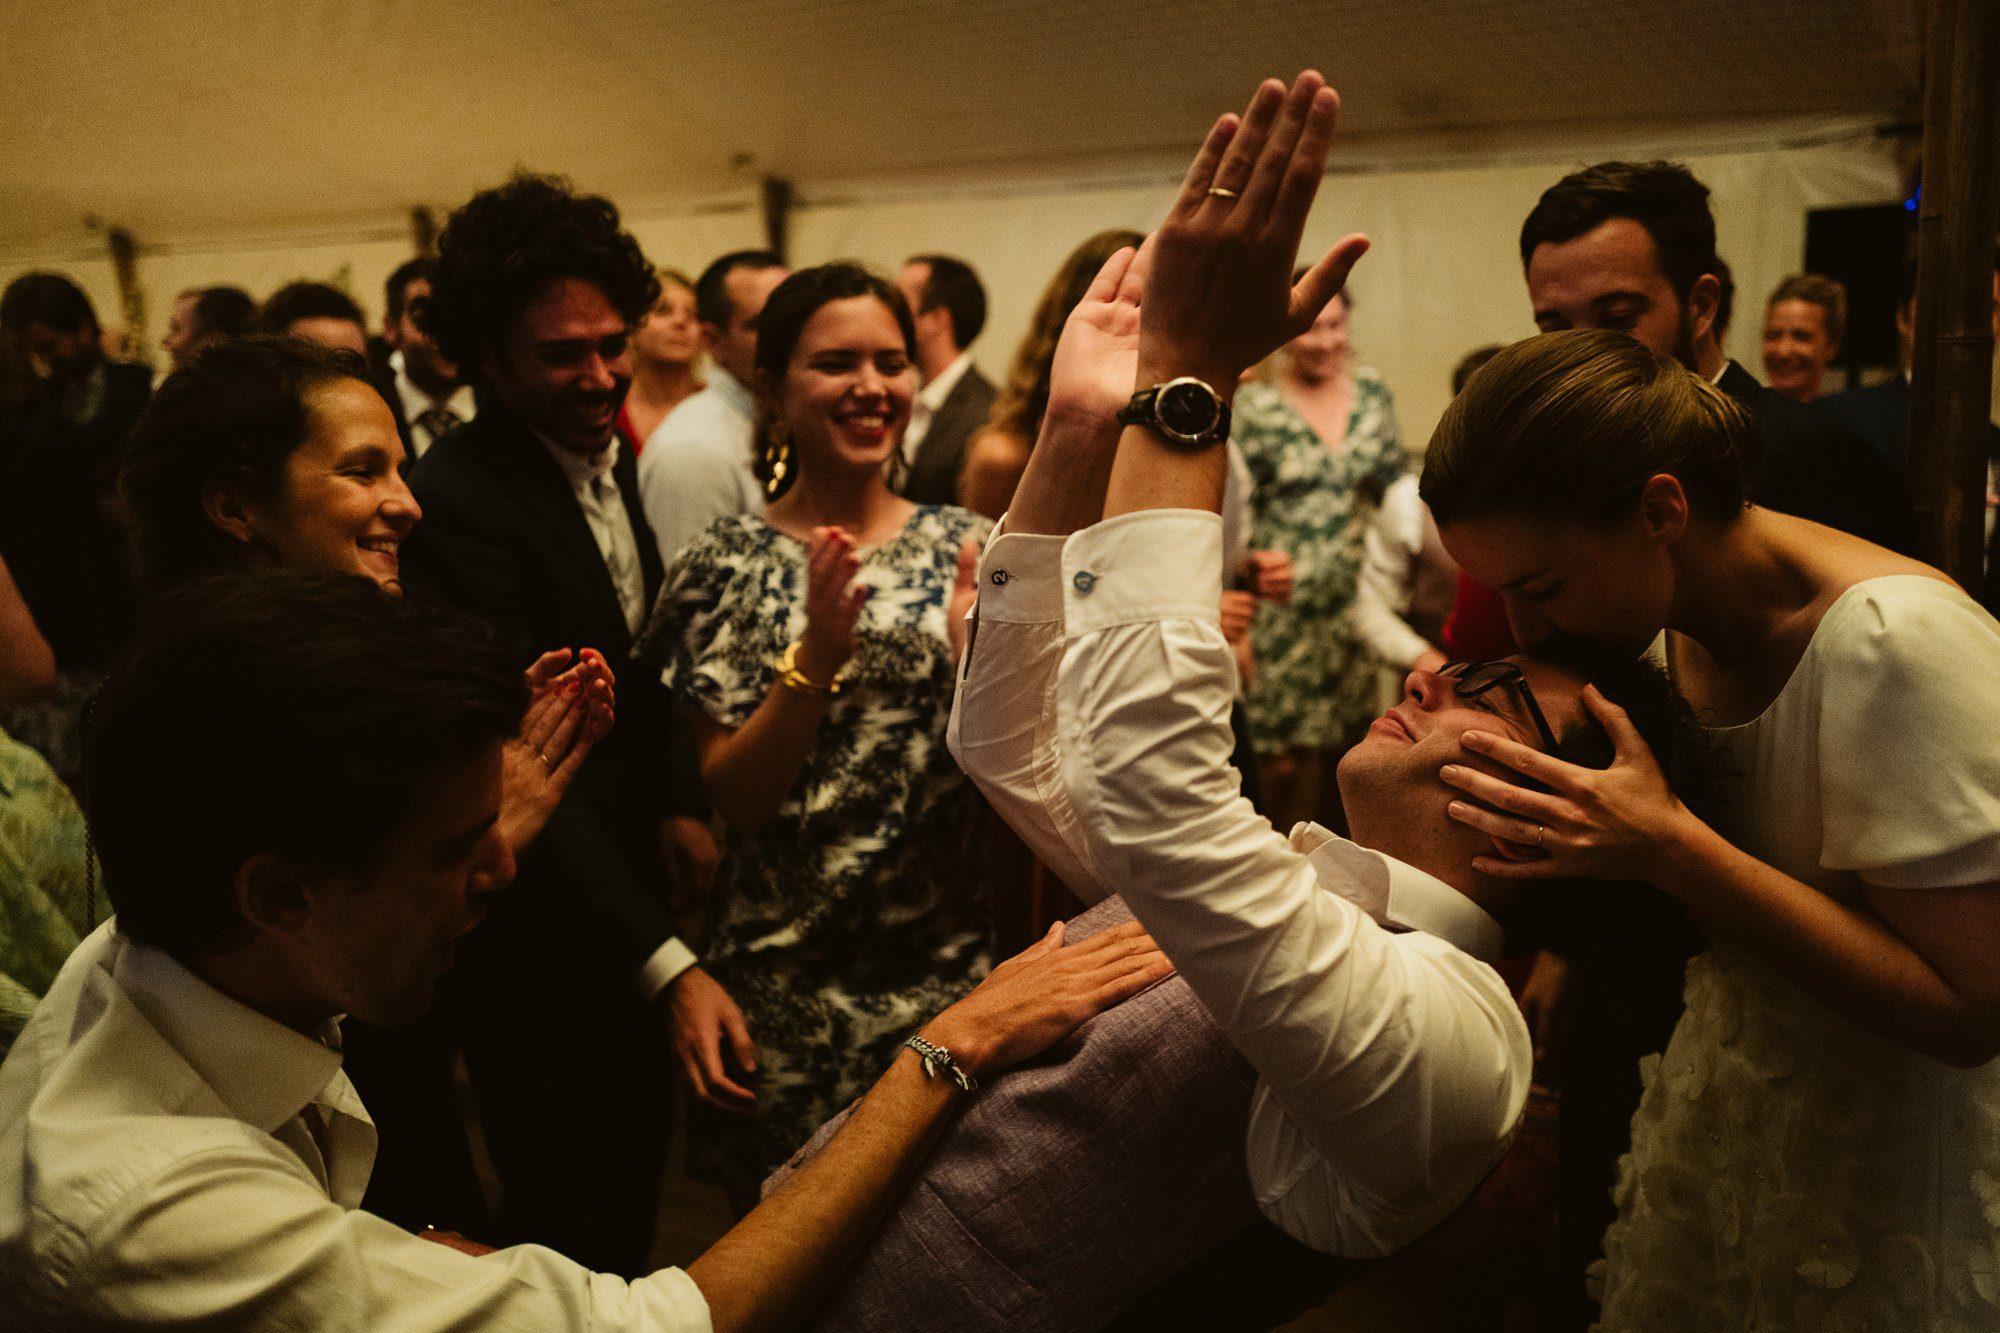 dancing french wedding